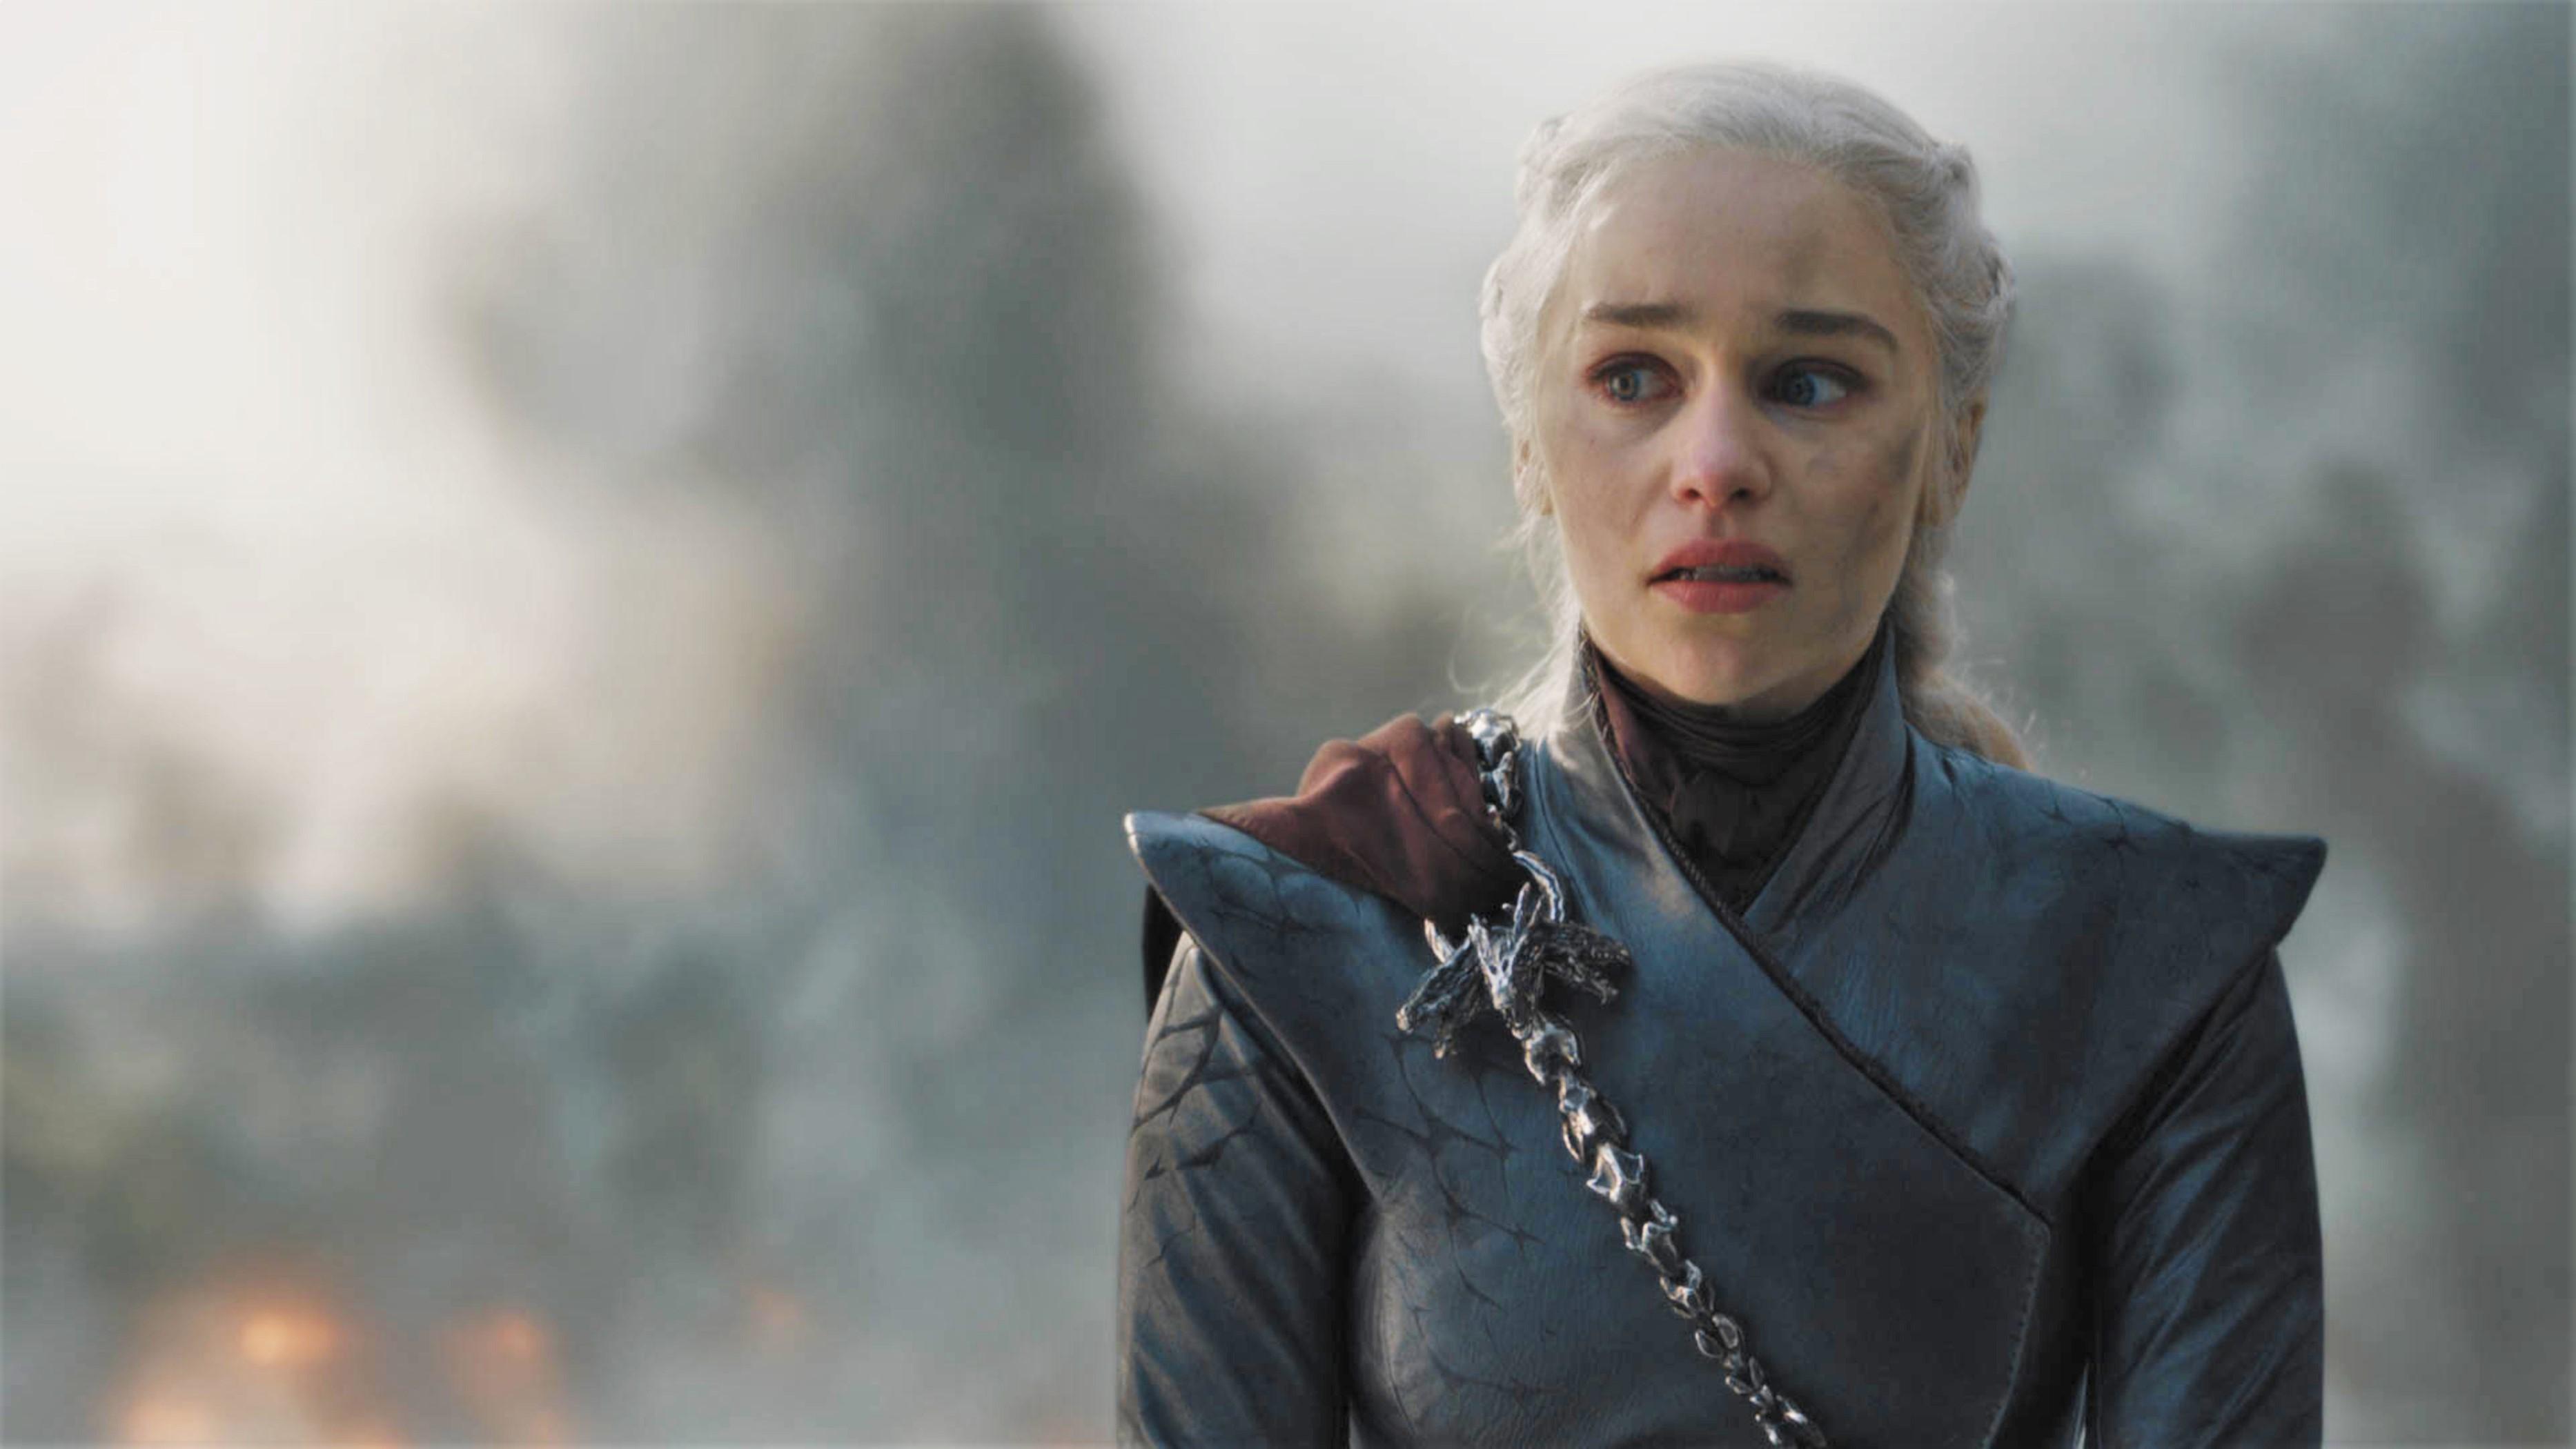 Daenerys Targaryen King's Landing Season 8 806 The Bells